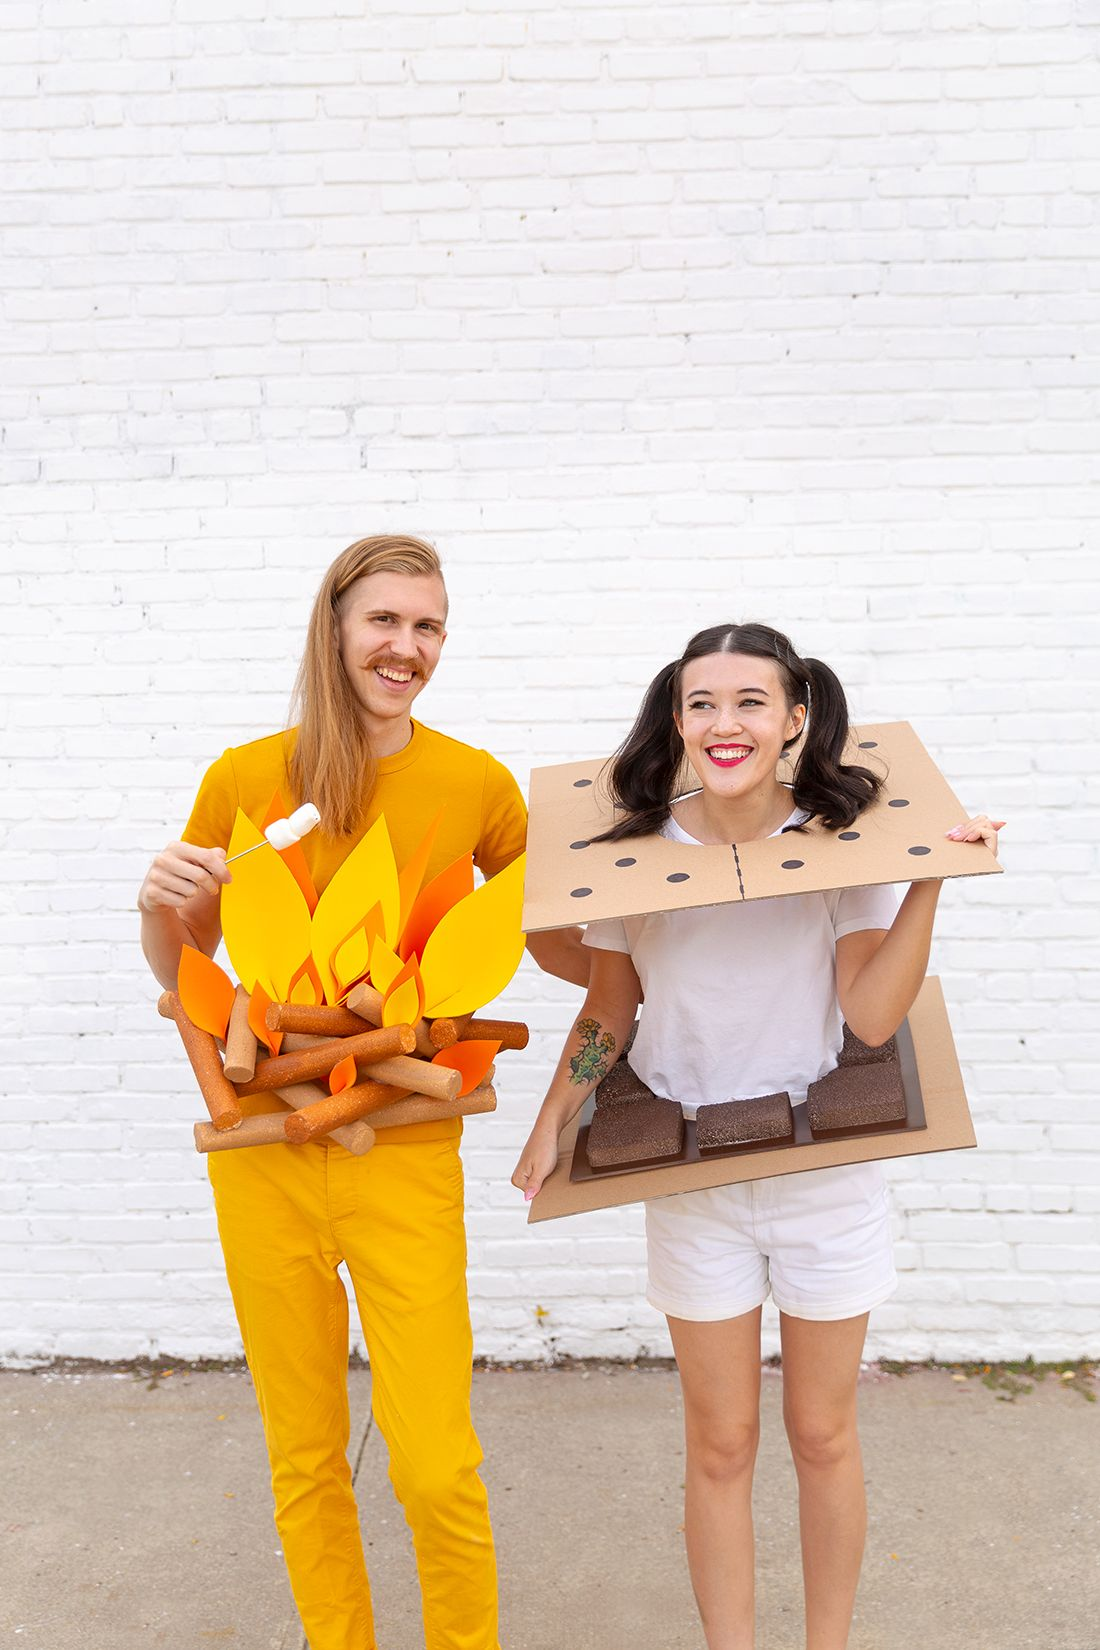 Creative Halloween Costumes For Friends.40 Best Friend Halloween Costumes 2021 Diy Matching Costumes For Friends